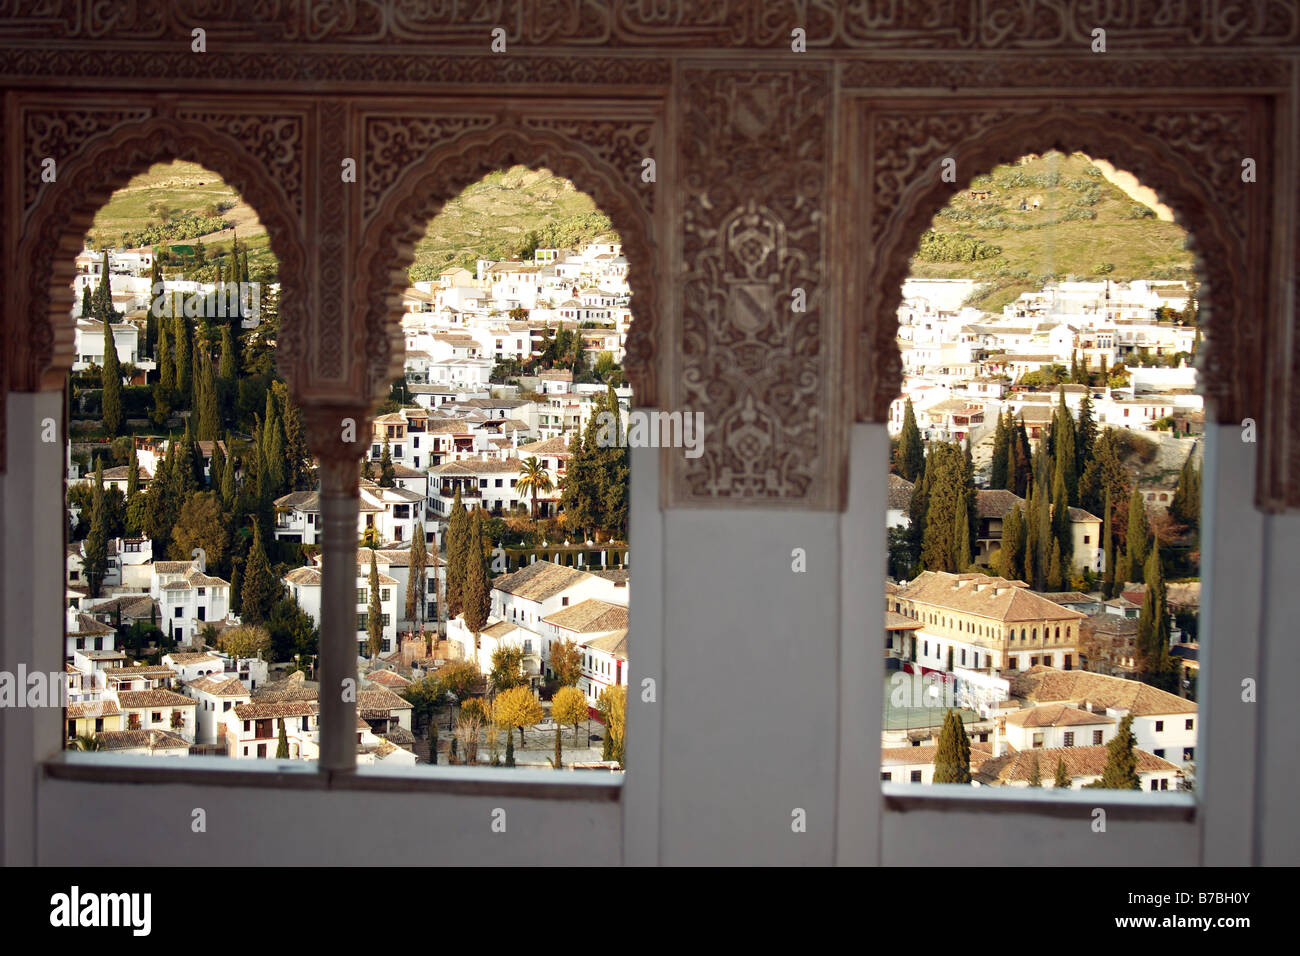 Albaycin view from La Alhambra windows in Granada, Spain. Stock Photo